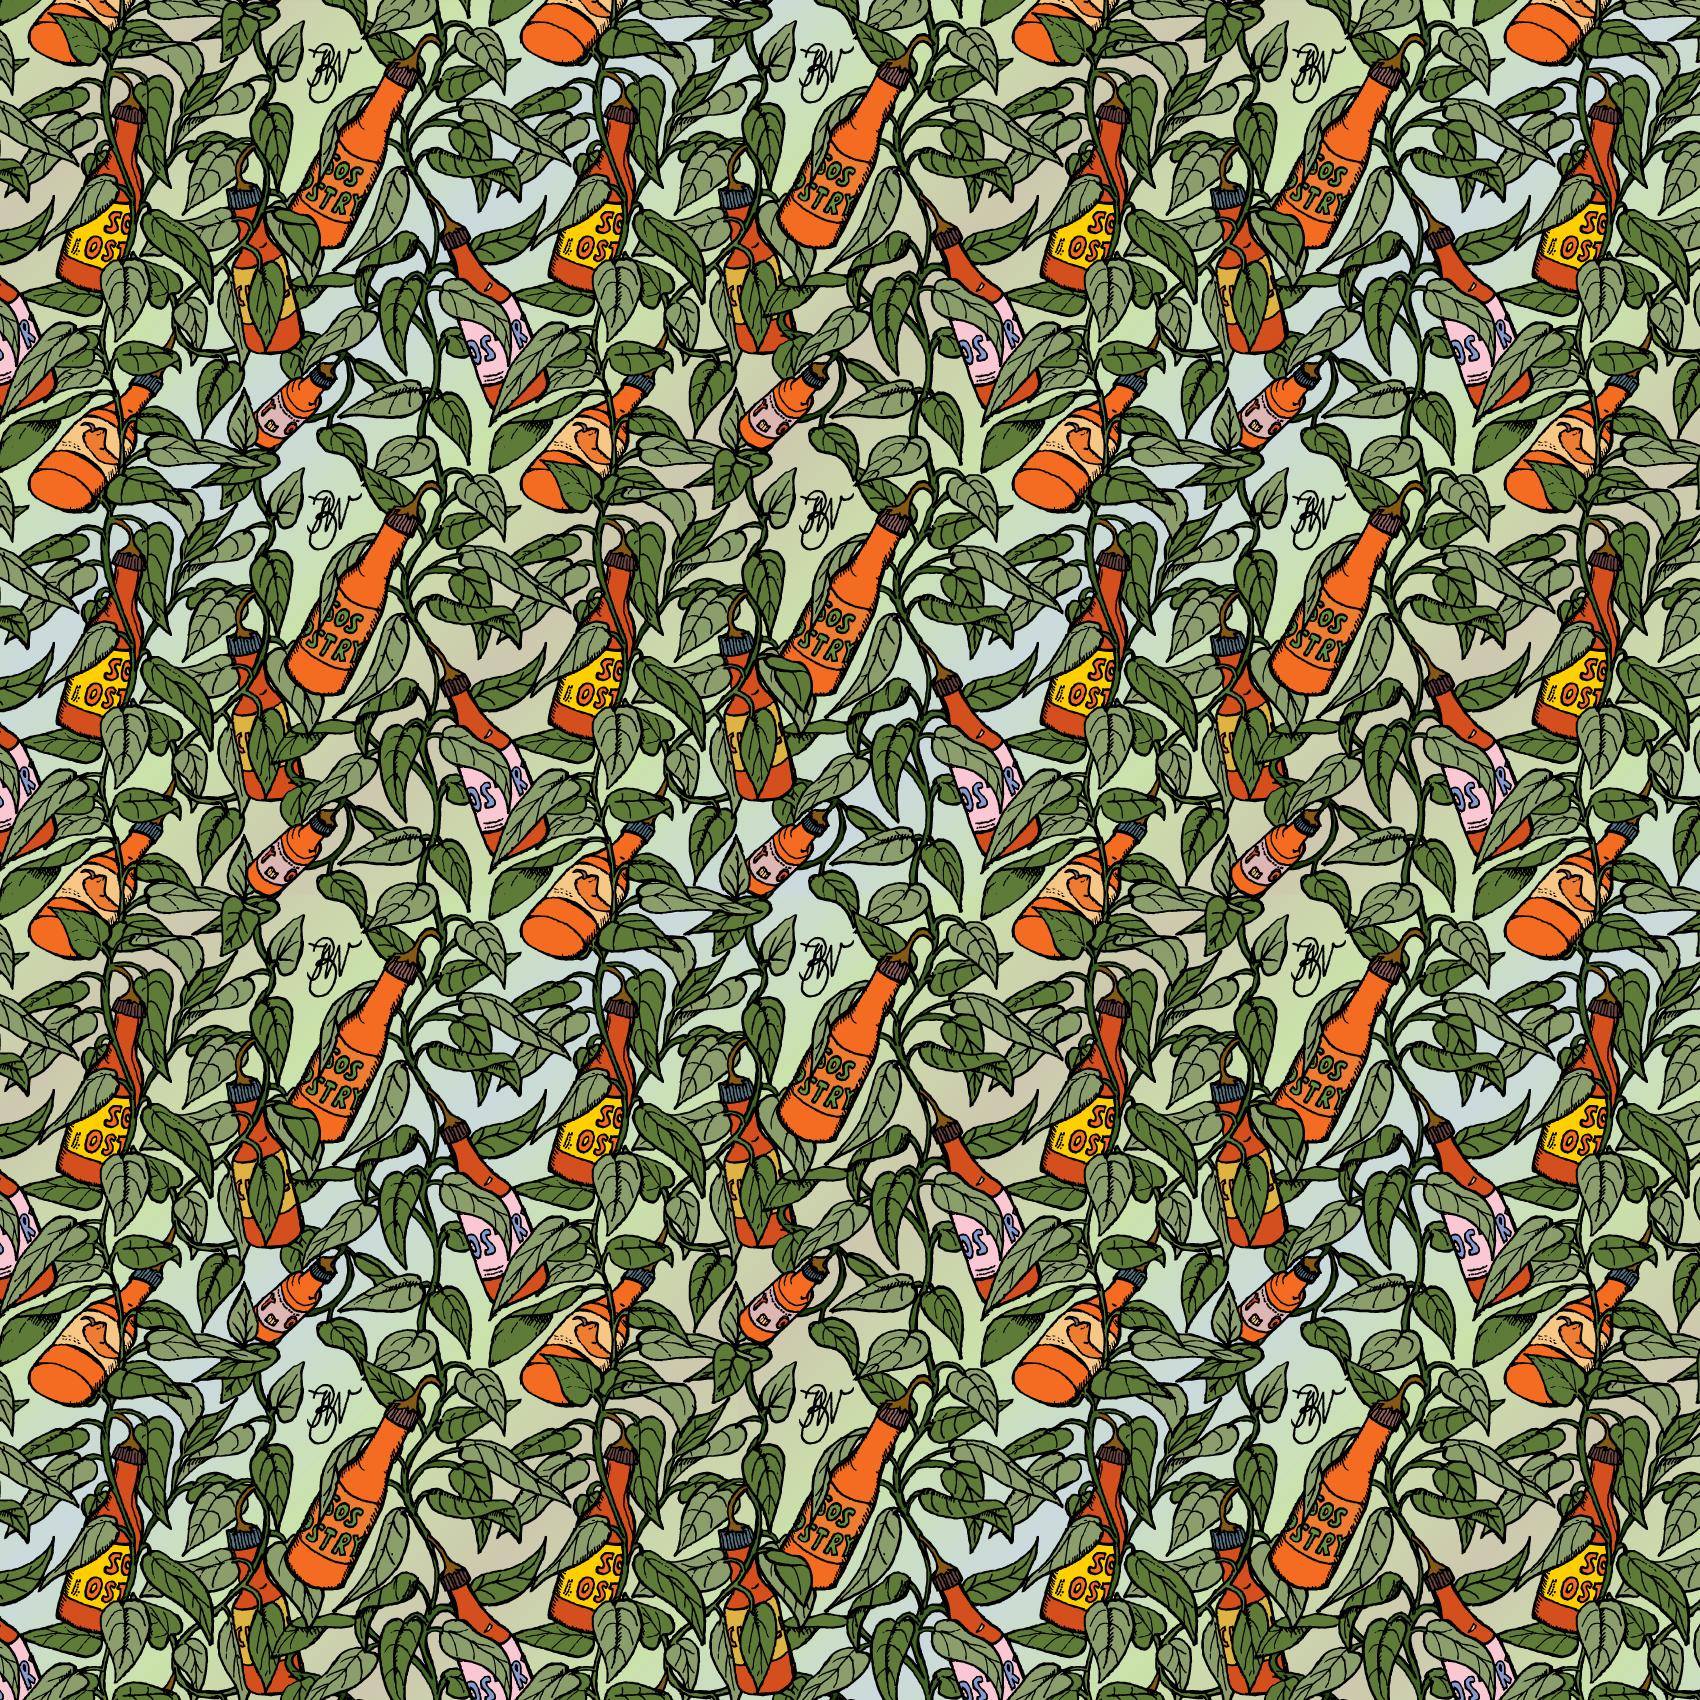 'Hot Sauce Tree' pattern